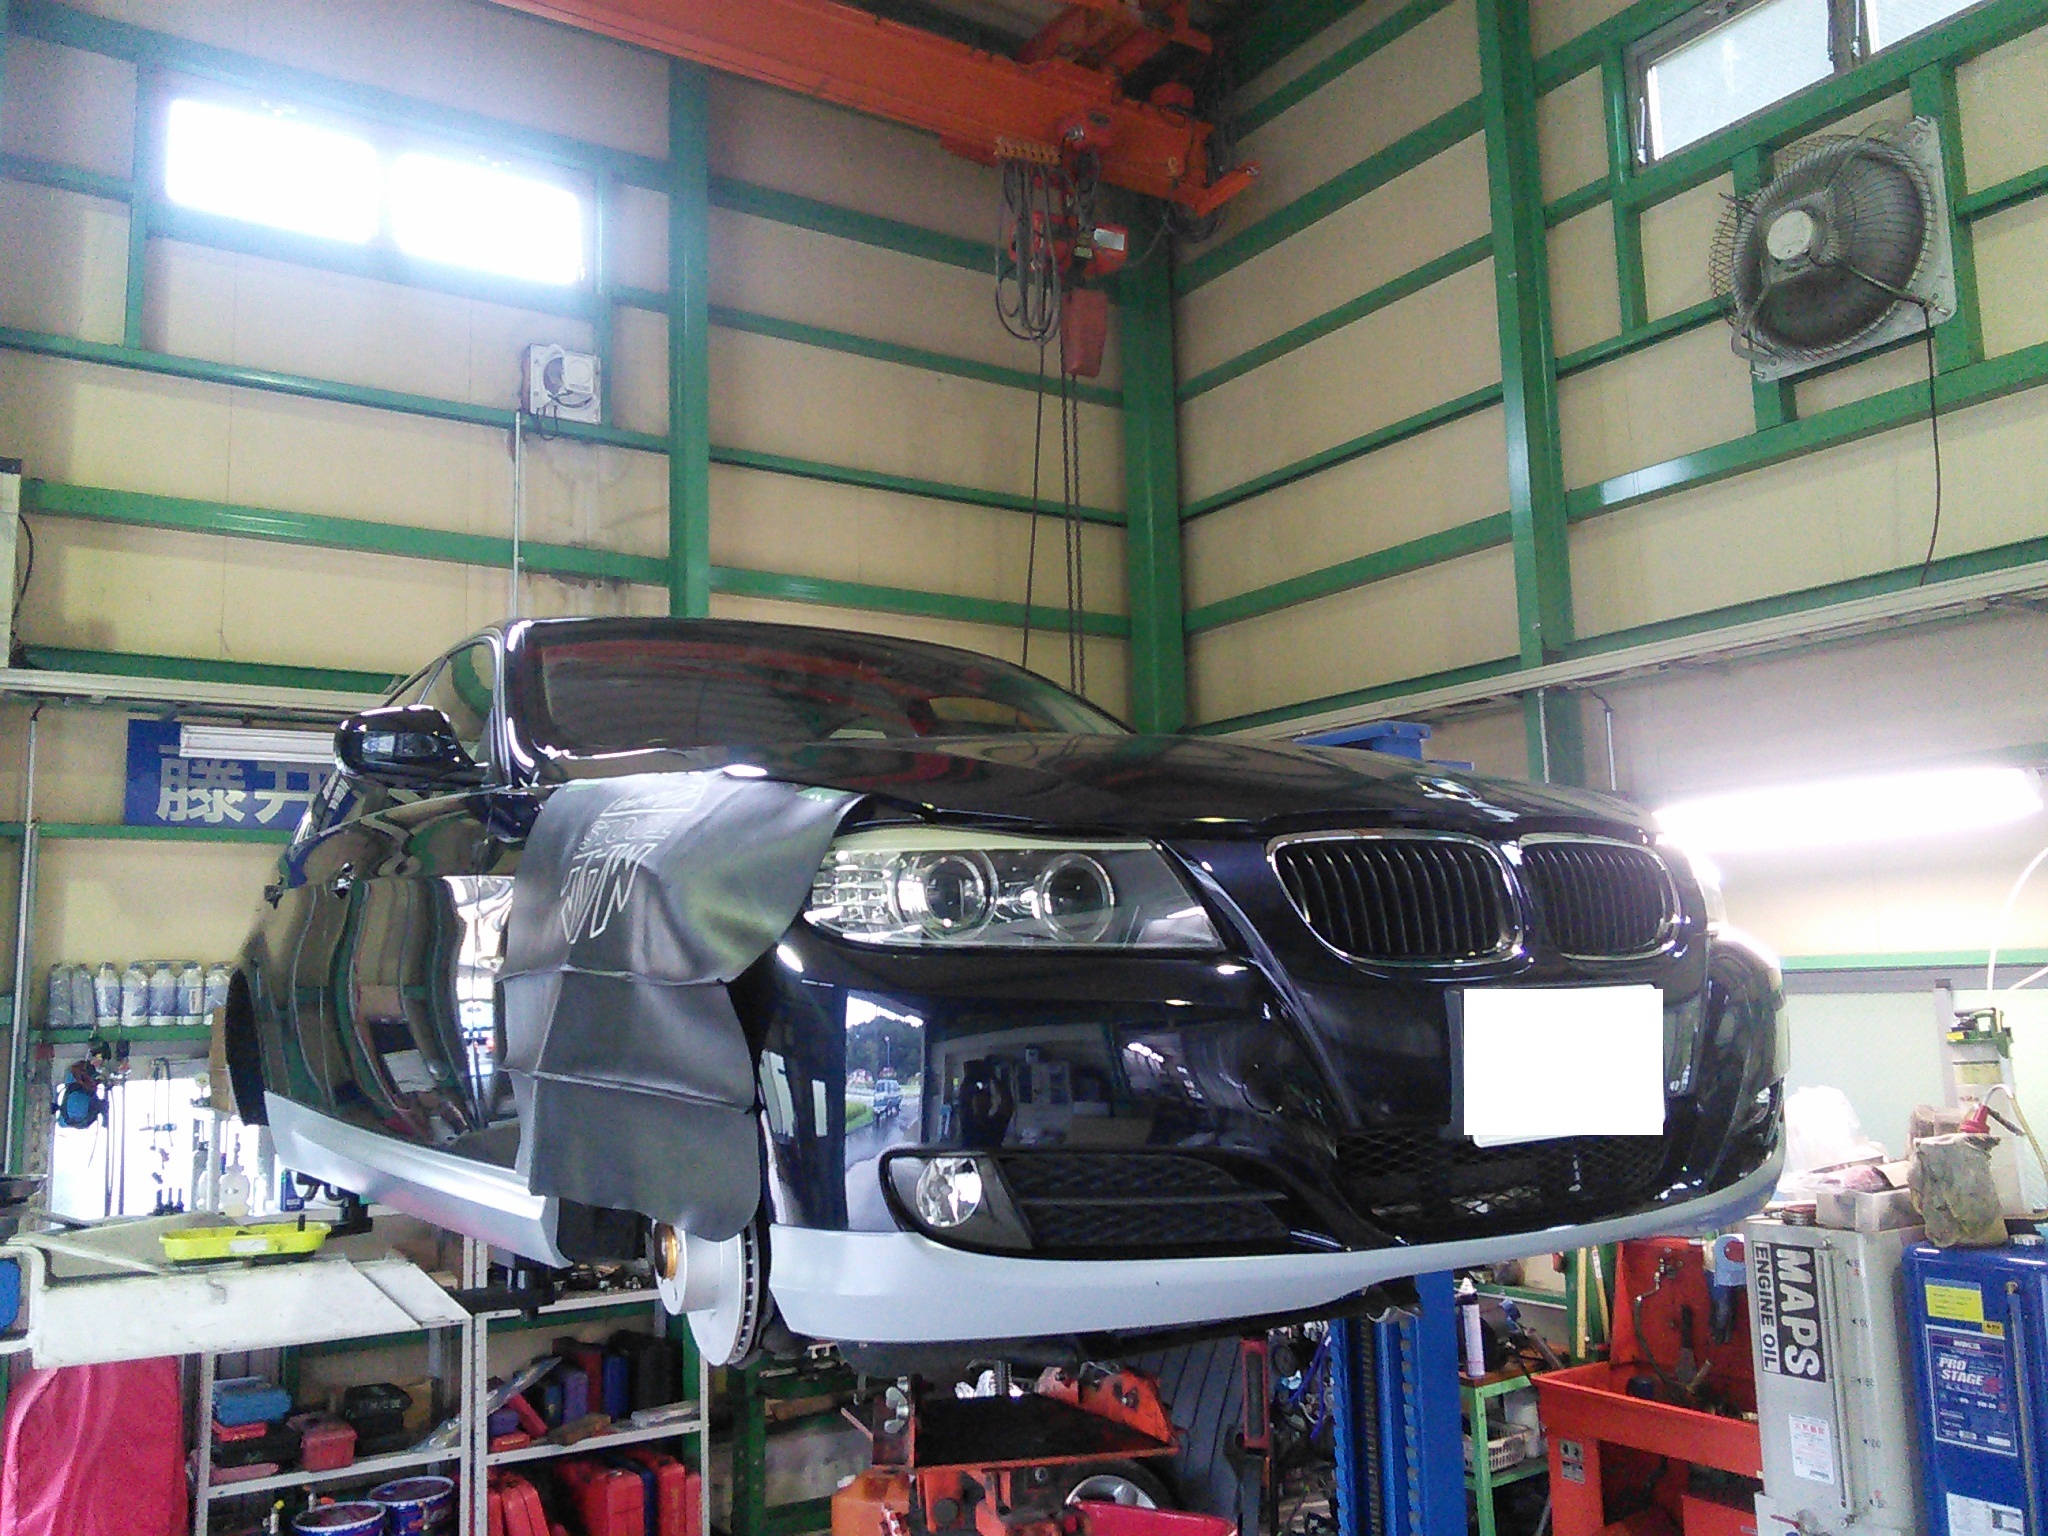 BMW 320 車検整備 オイル漏れ修理など